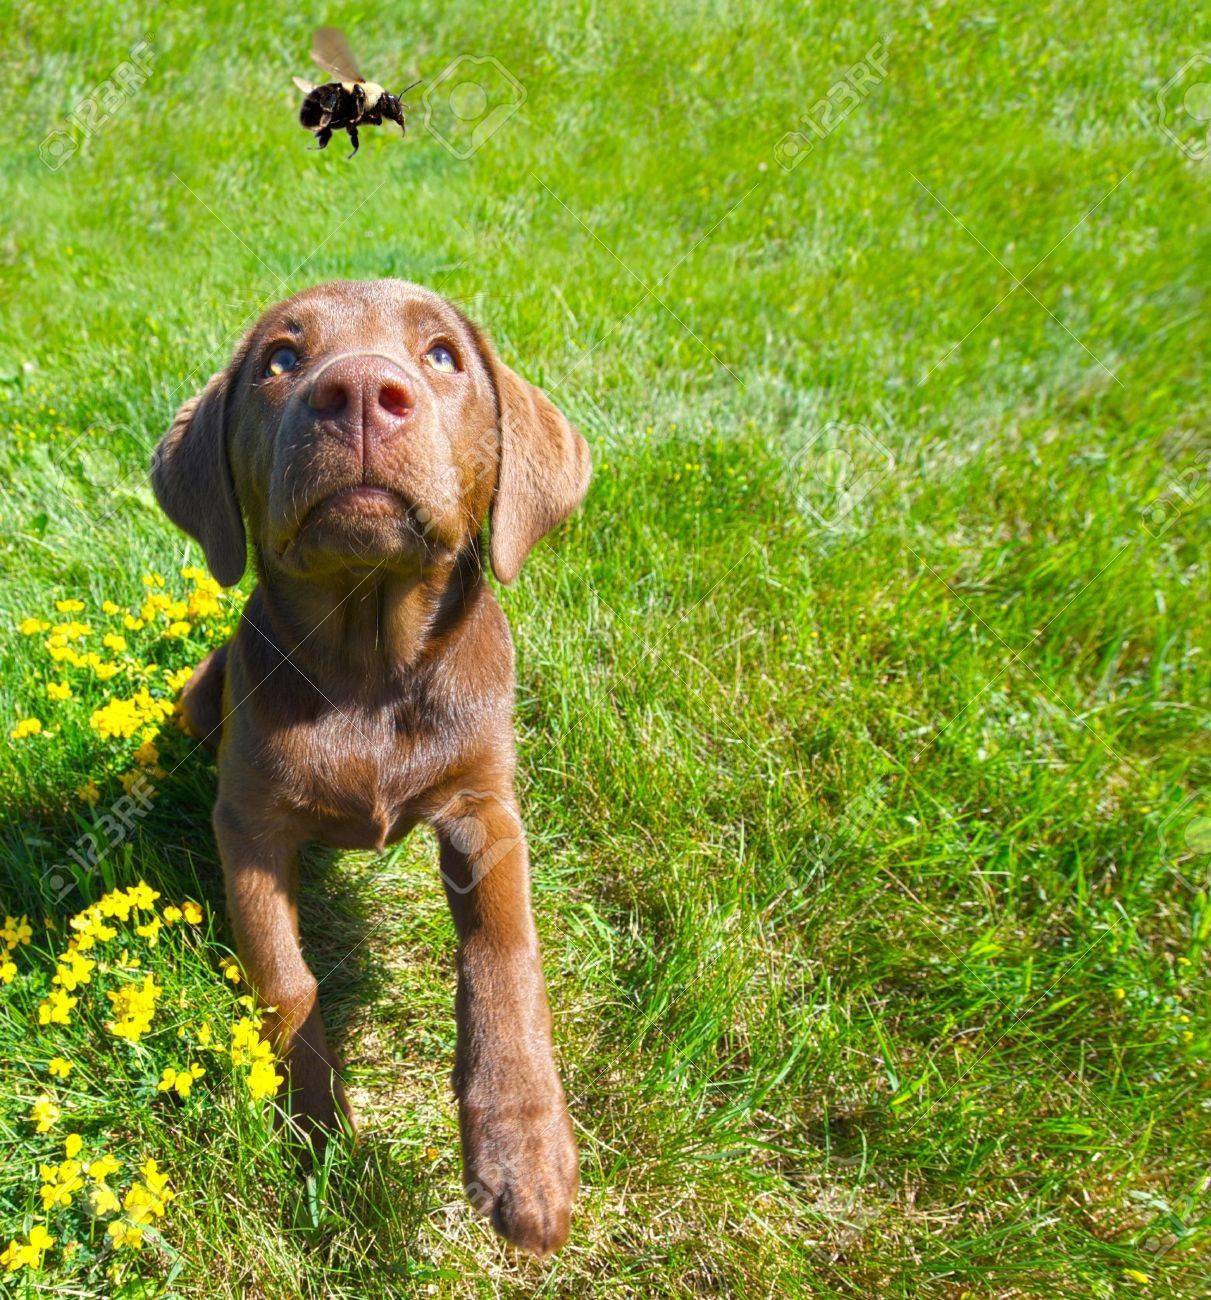 Imagen Chistosa De Gran Angular De Un Cachorro De Labrador Color